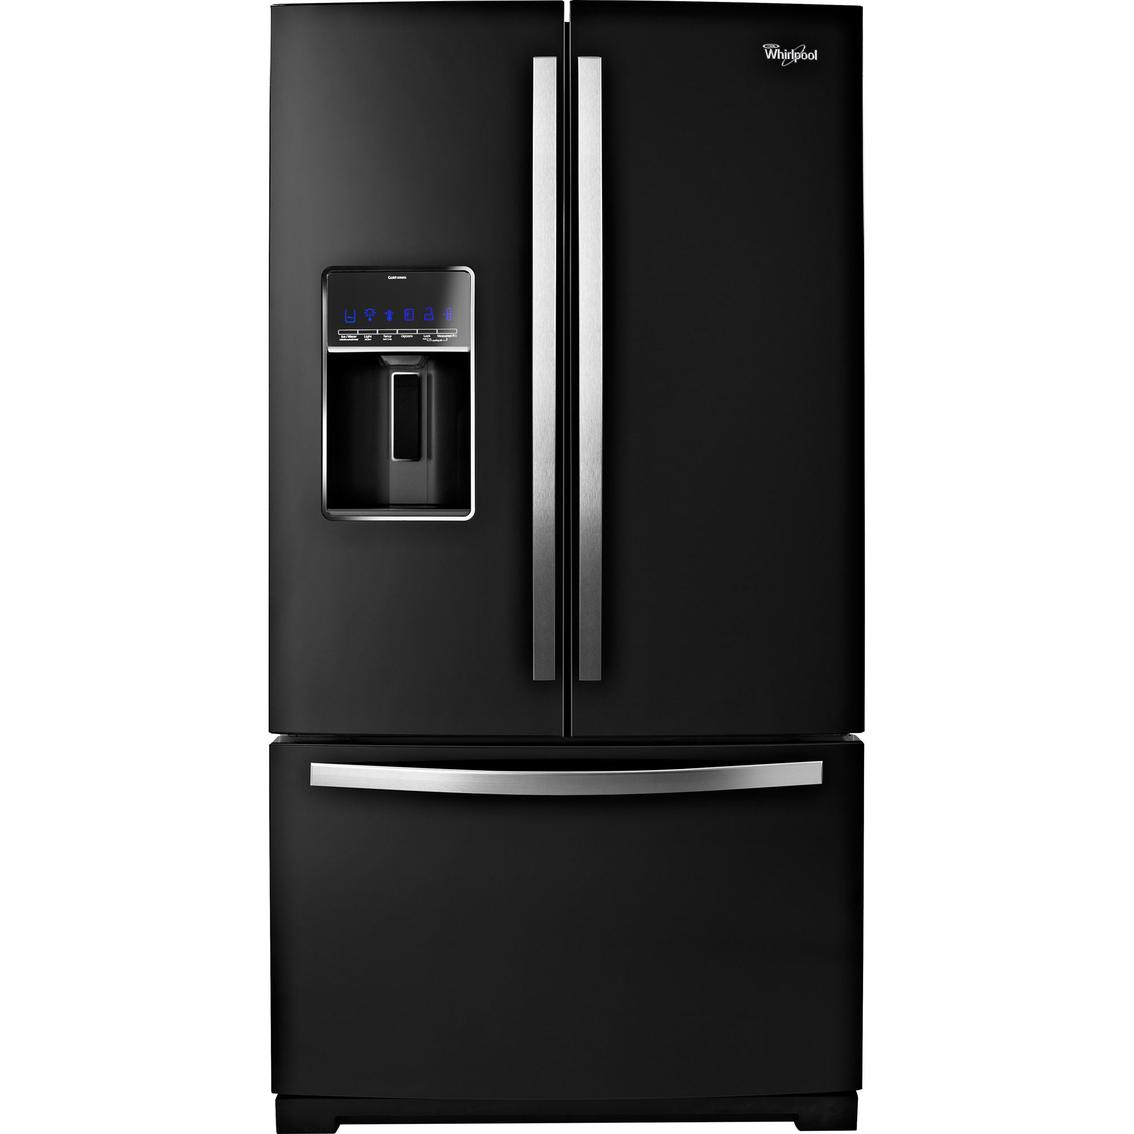 Whirlpool energy star 27 cu ft refrigerator freezer - Maytag whirlpool ...